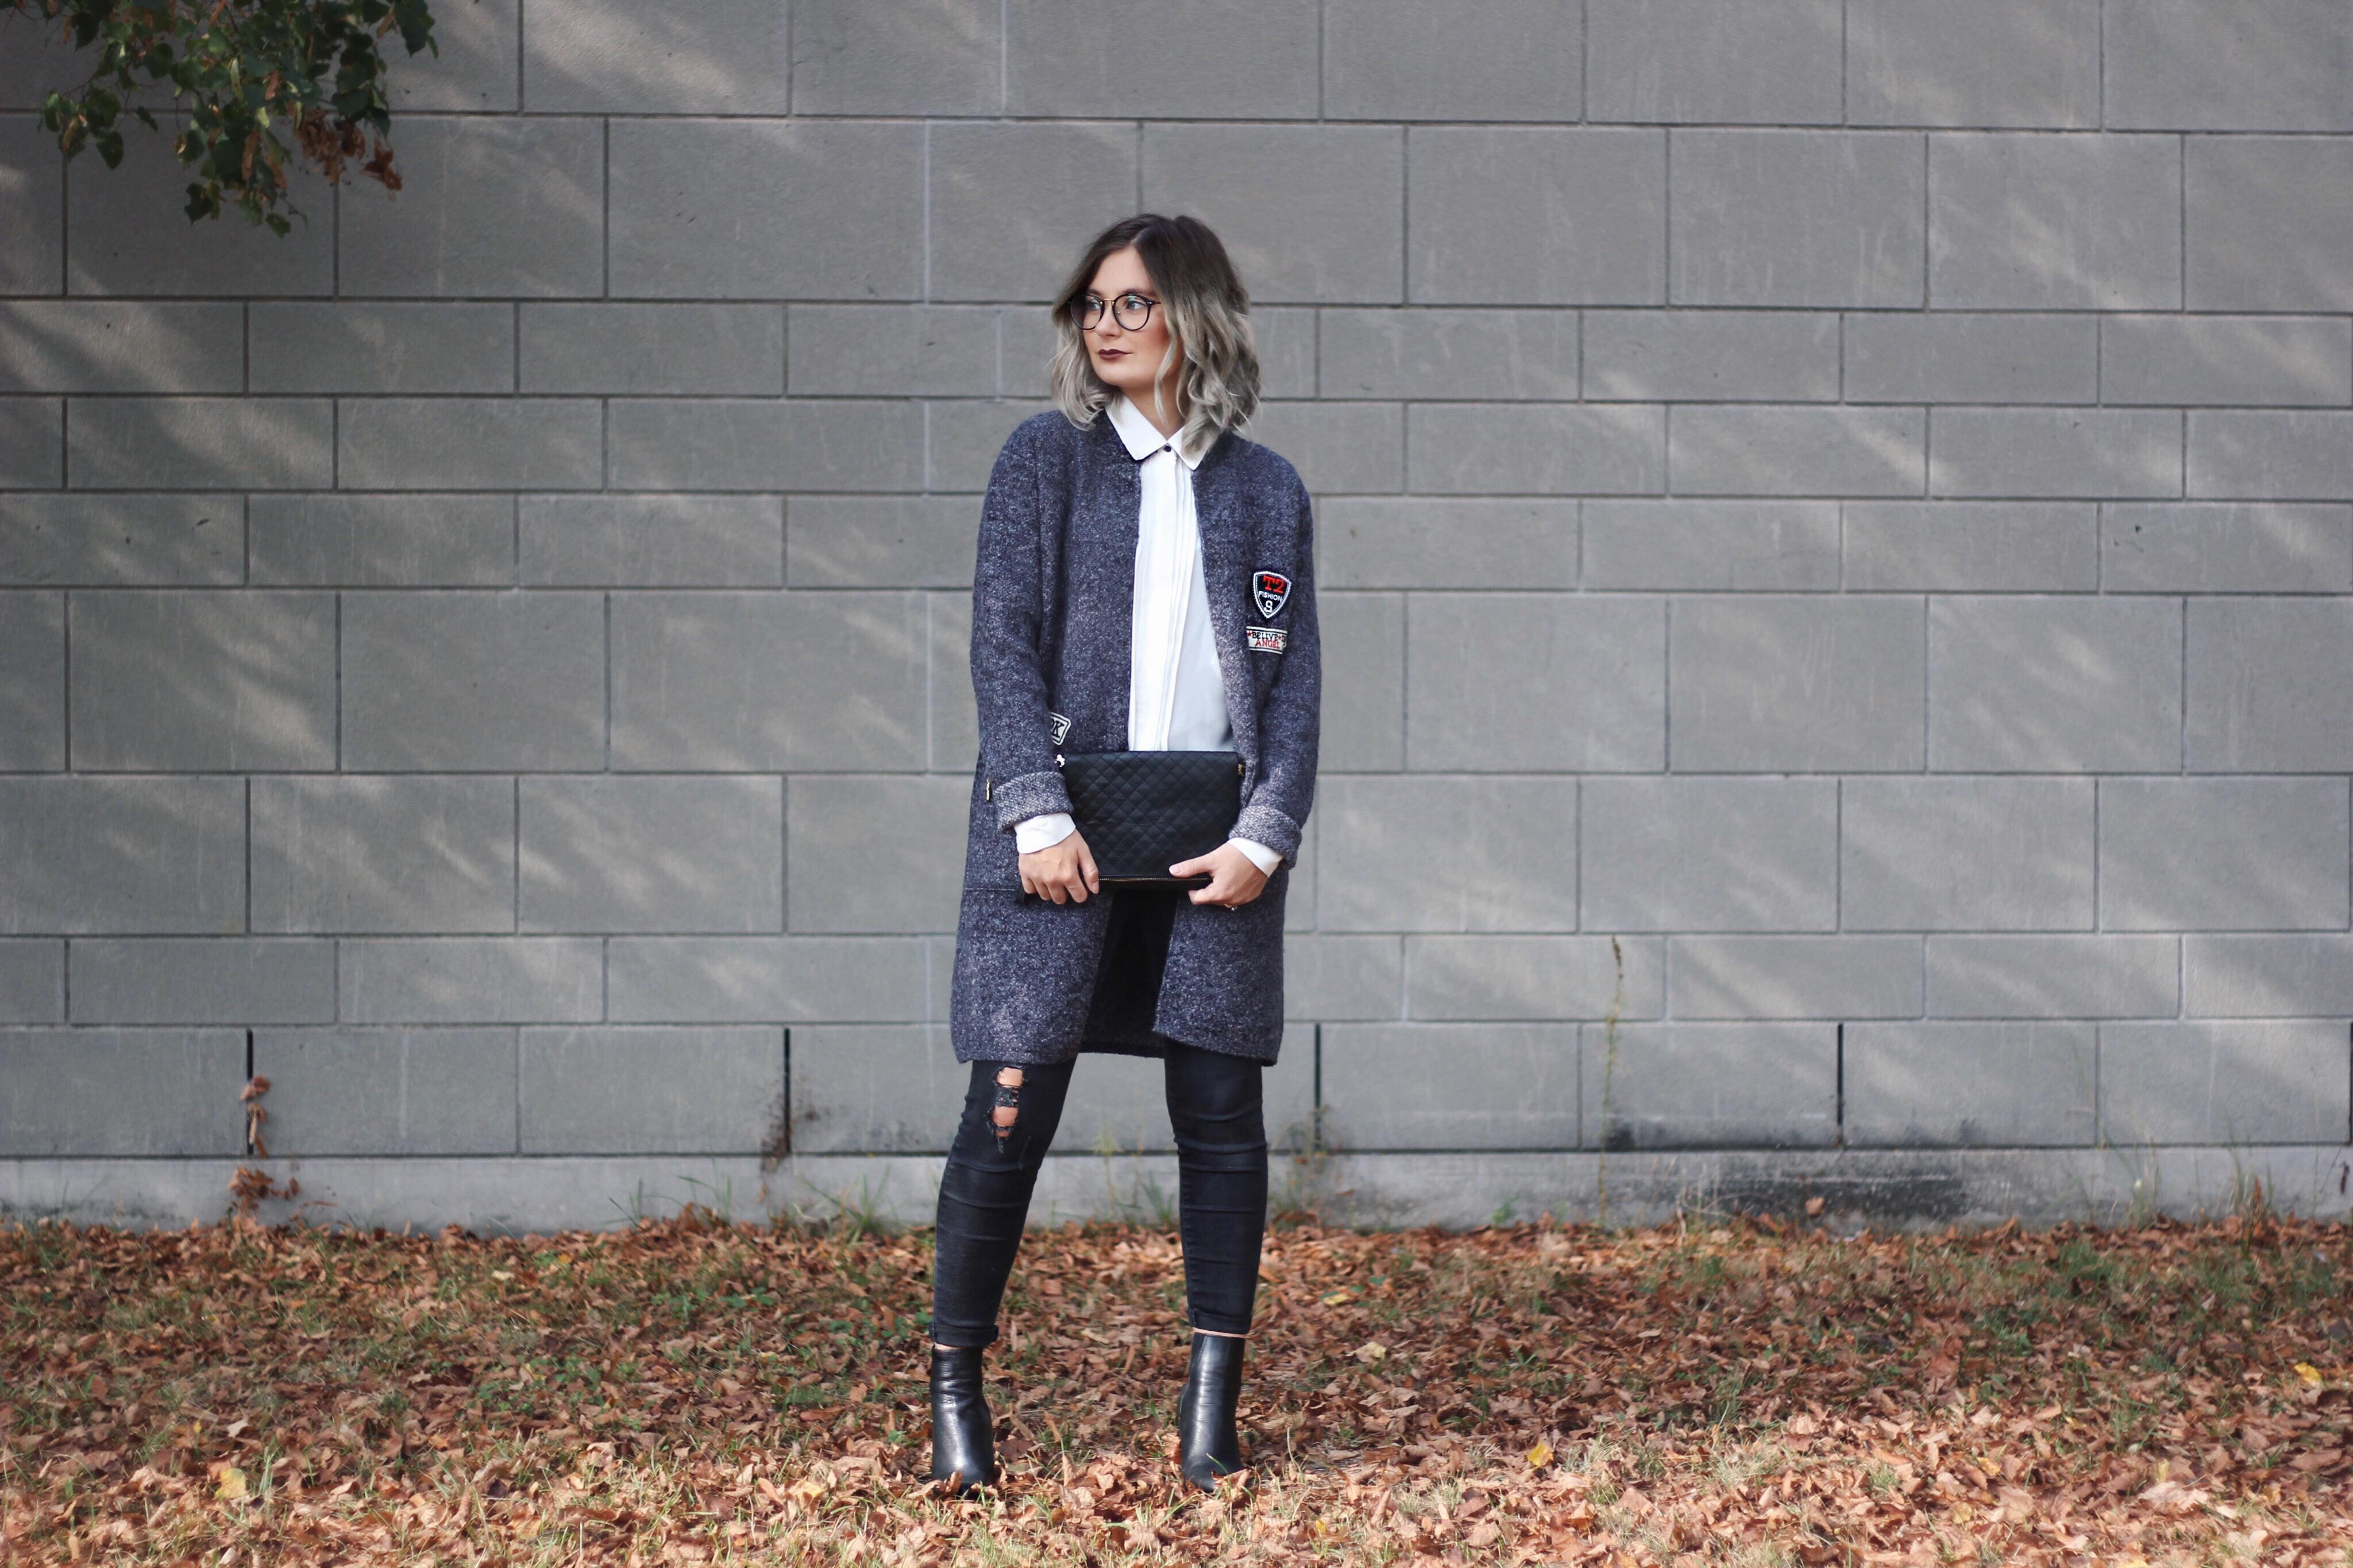 Jacke mit Patches, Herbsttrend 2016, Dear Fashion, Modeblog, Fashionblogger, Fashion Blog, graue Haare, Curls, brille, lookbook, outfit